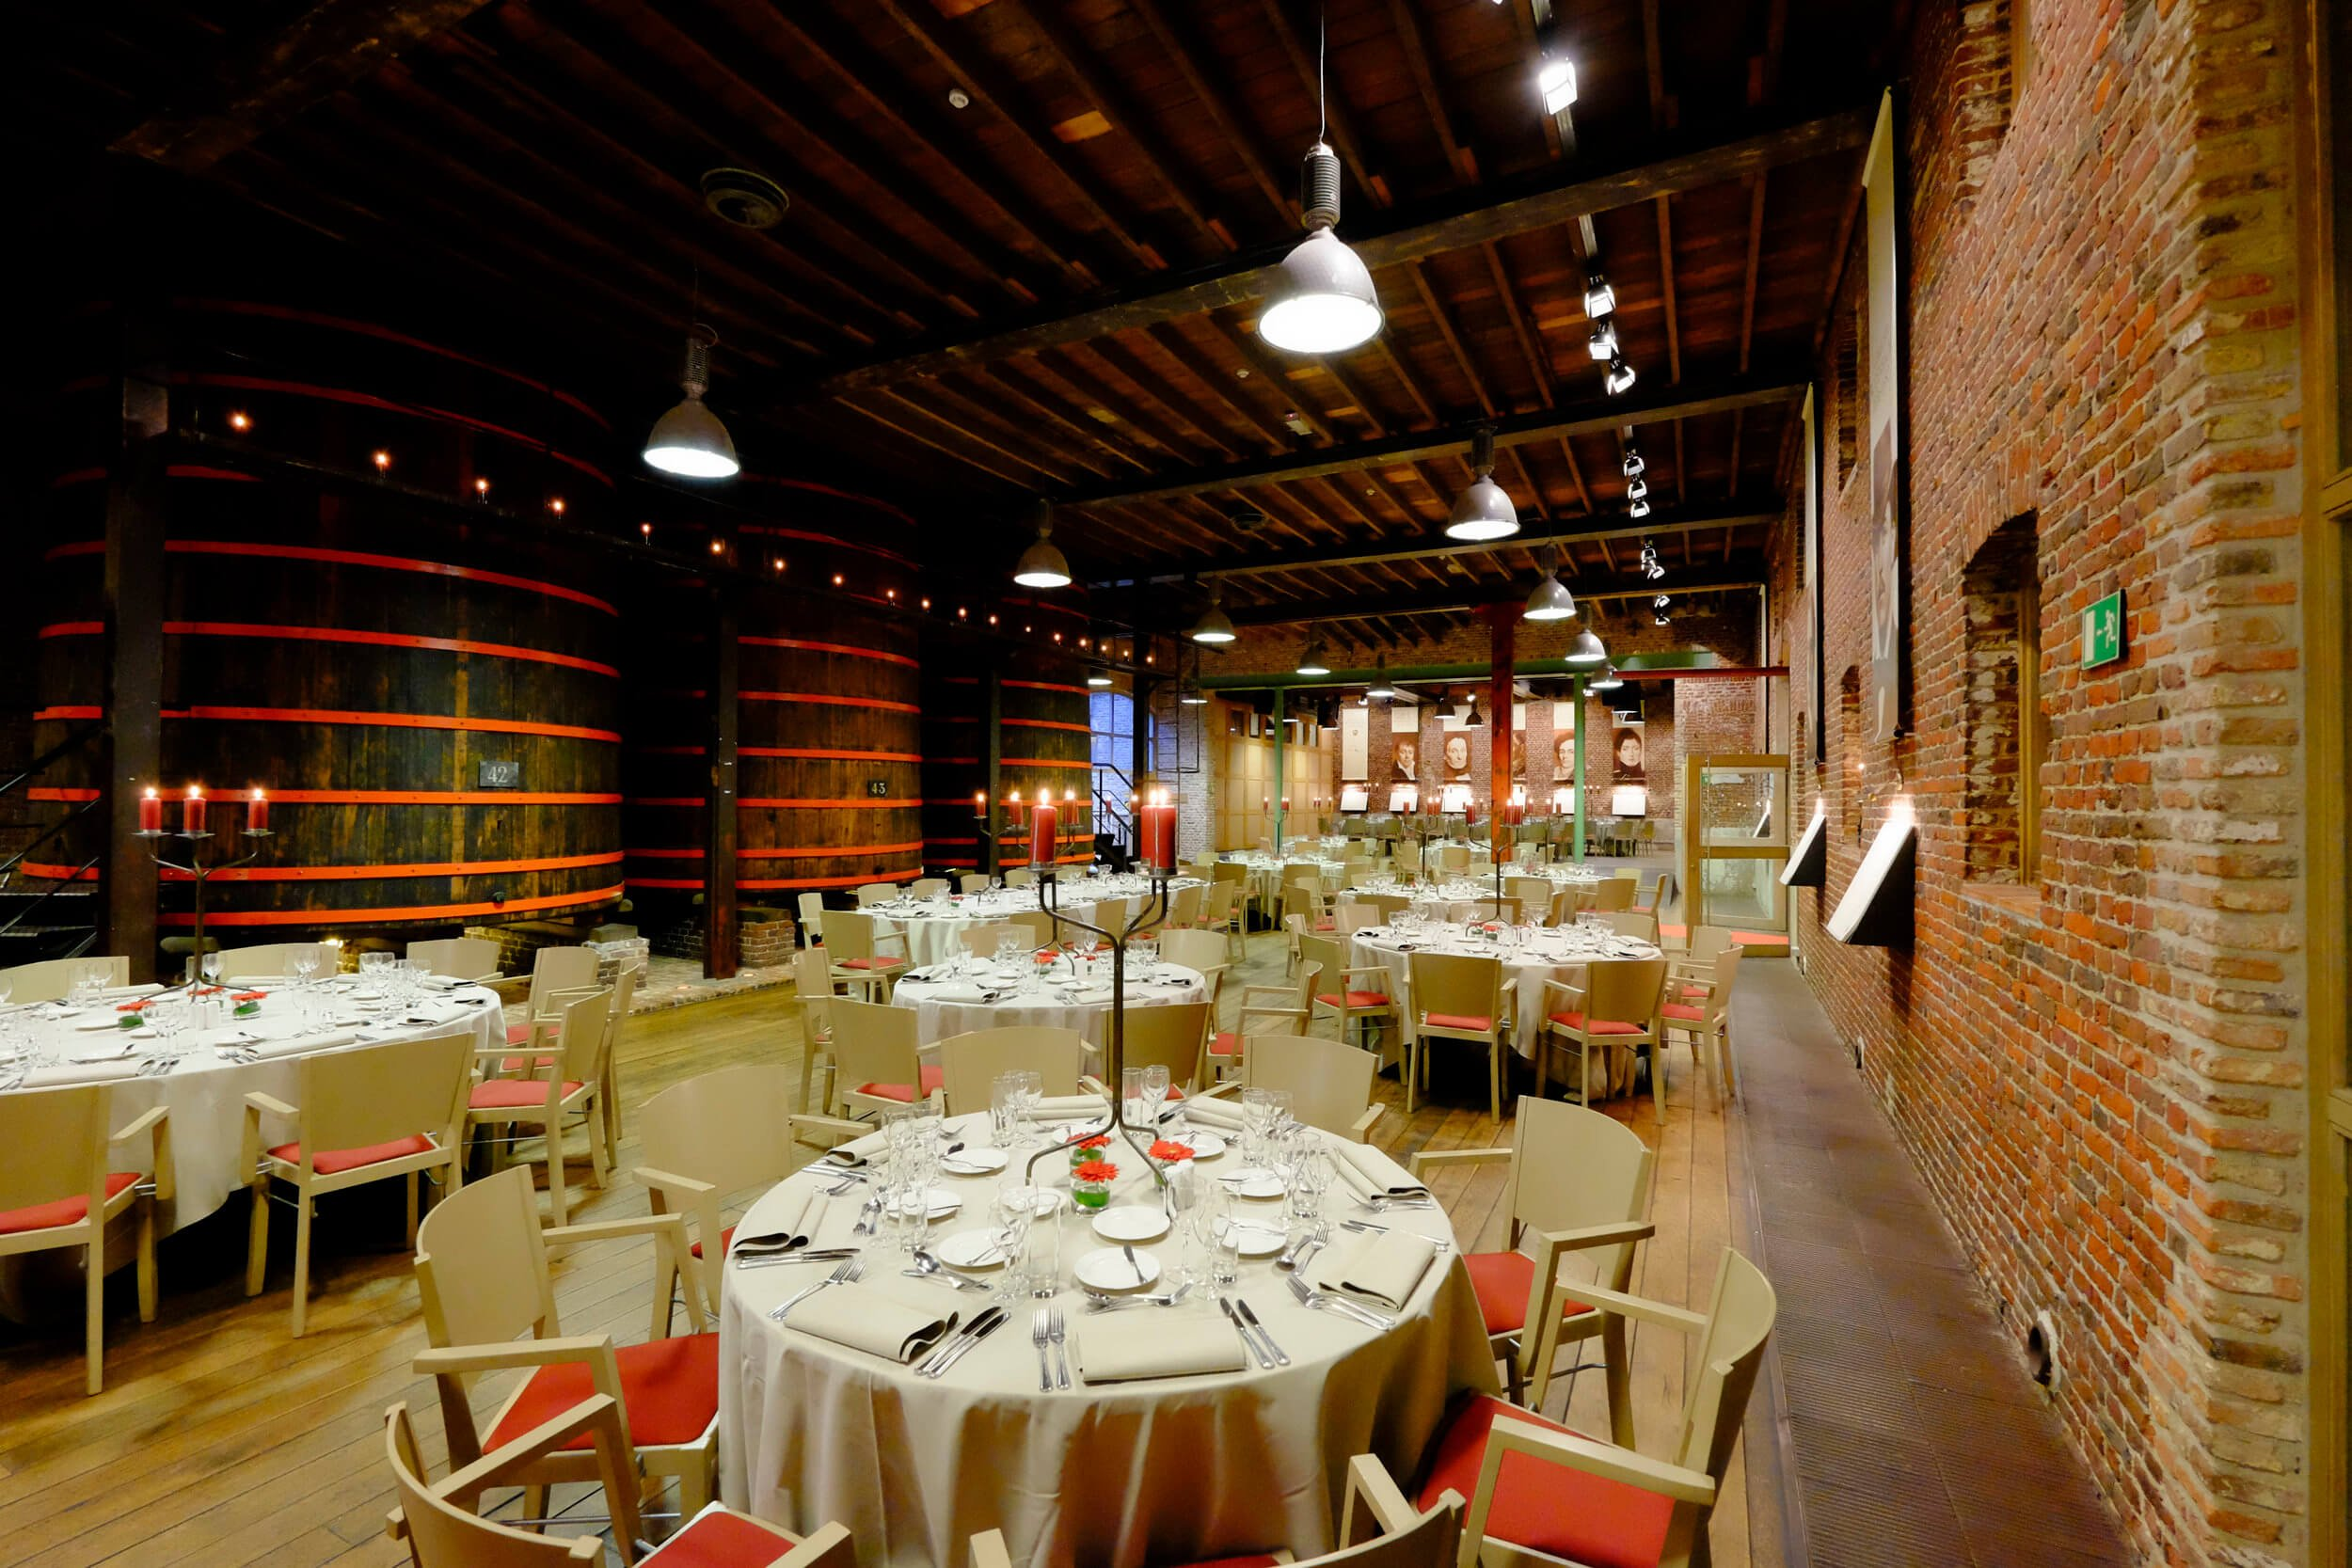 Inside the Brouwerij Rodenbach in Roeselare, Belgium